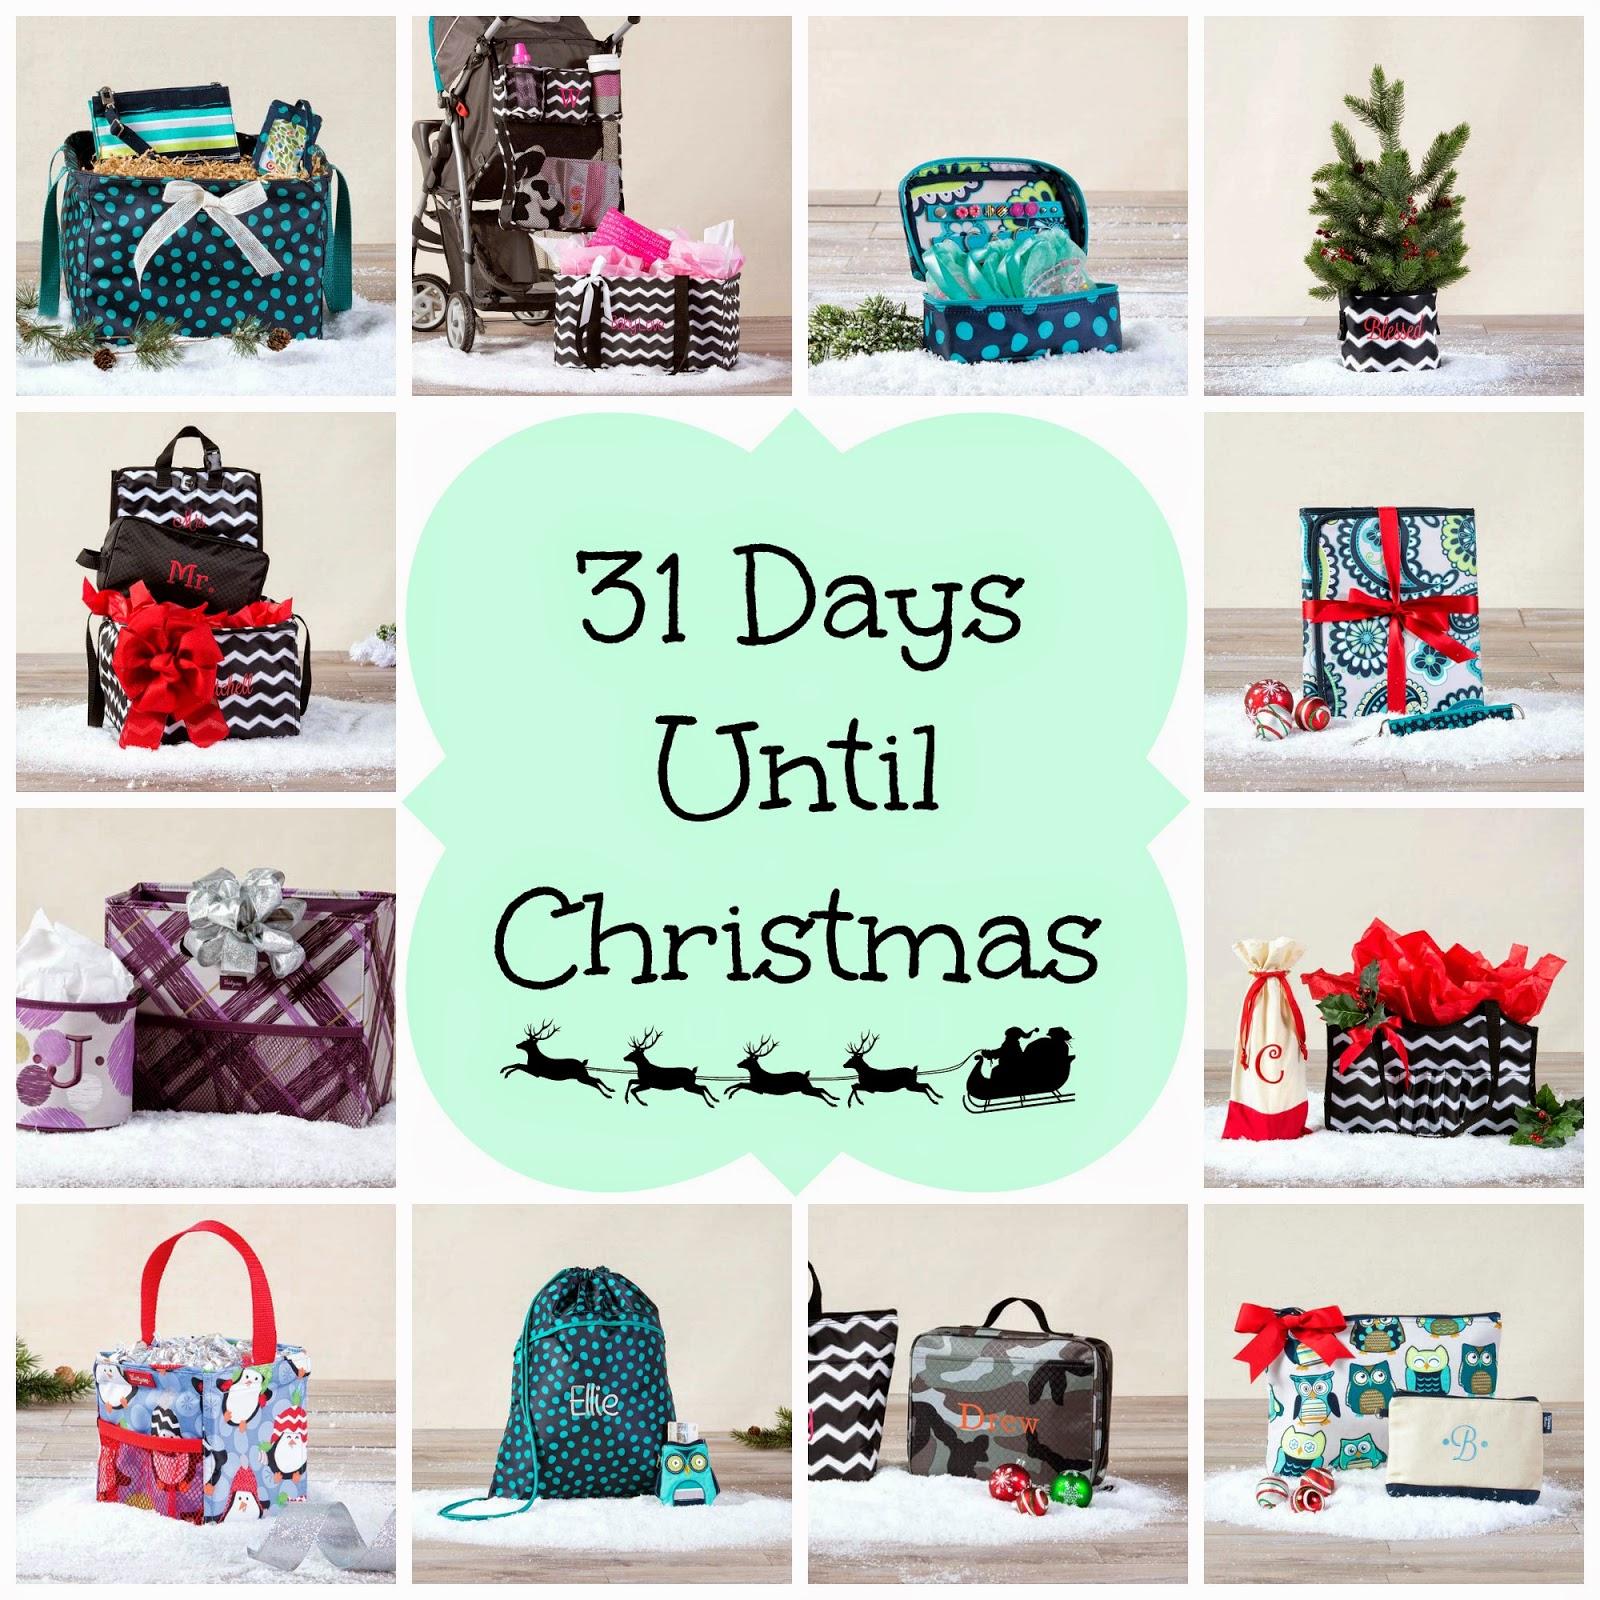 31 Days Until Christmas!